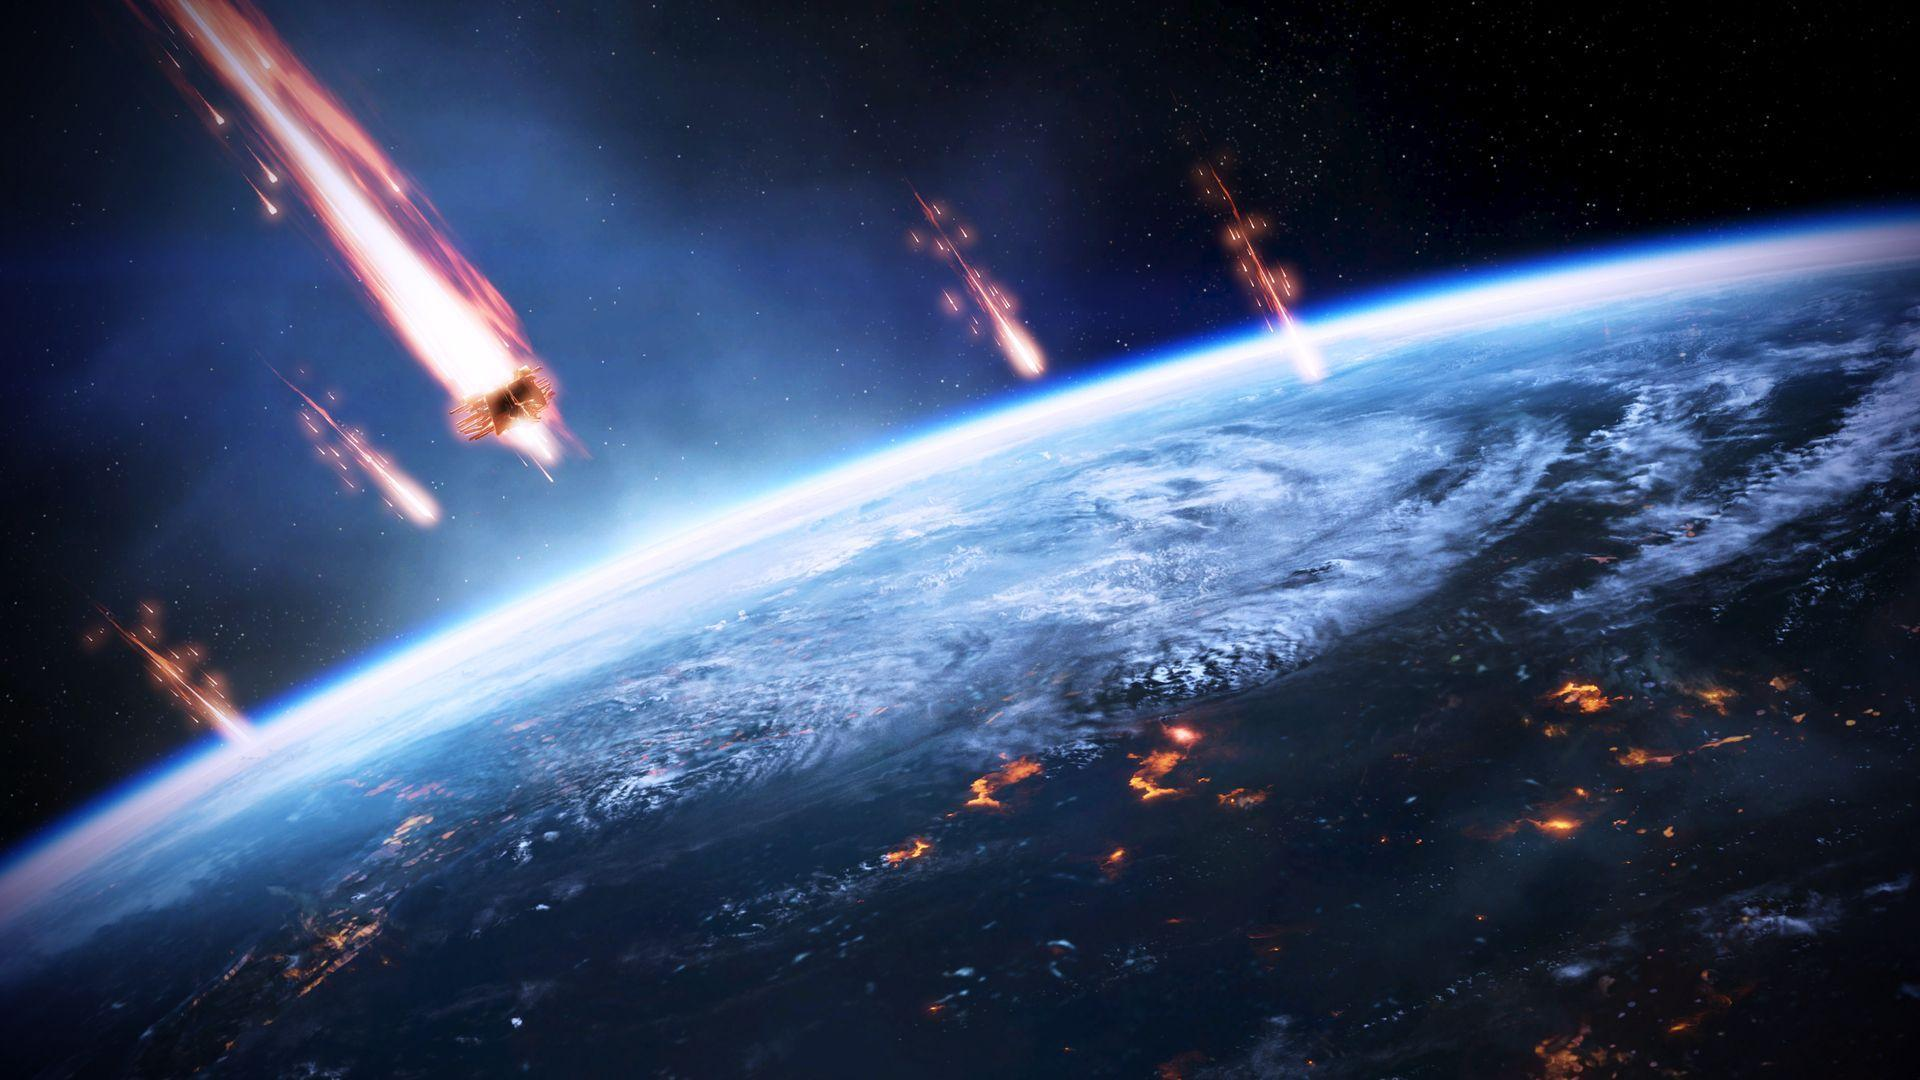 Meteor Shower Wallpapers, Good HDQ Live Meteor Shower Pics ...